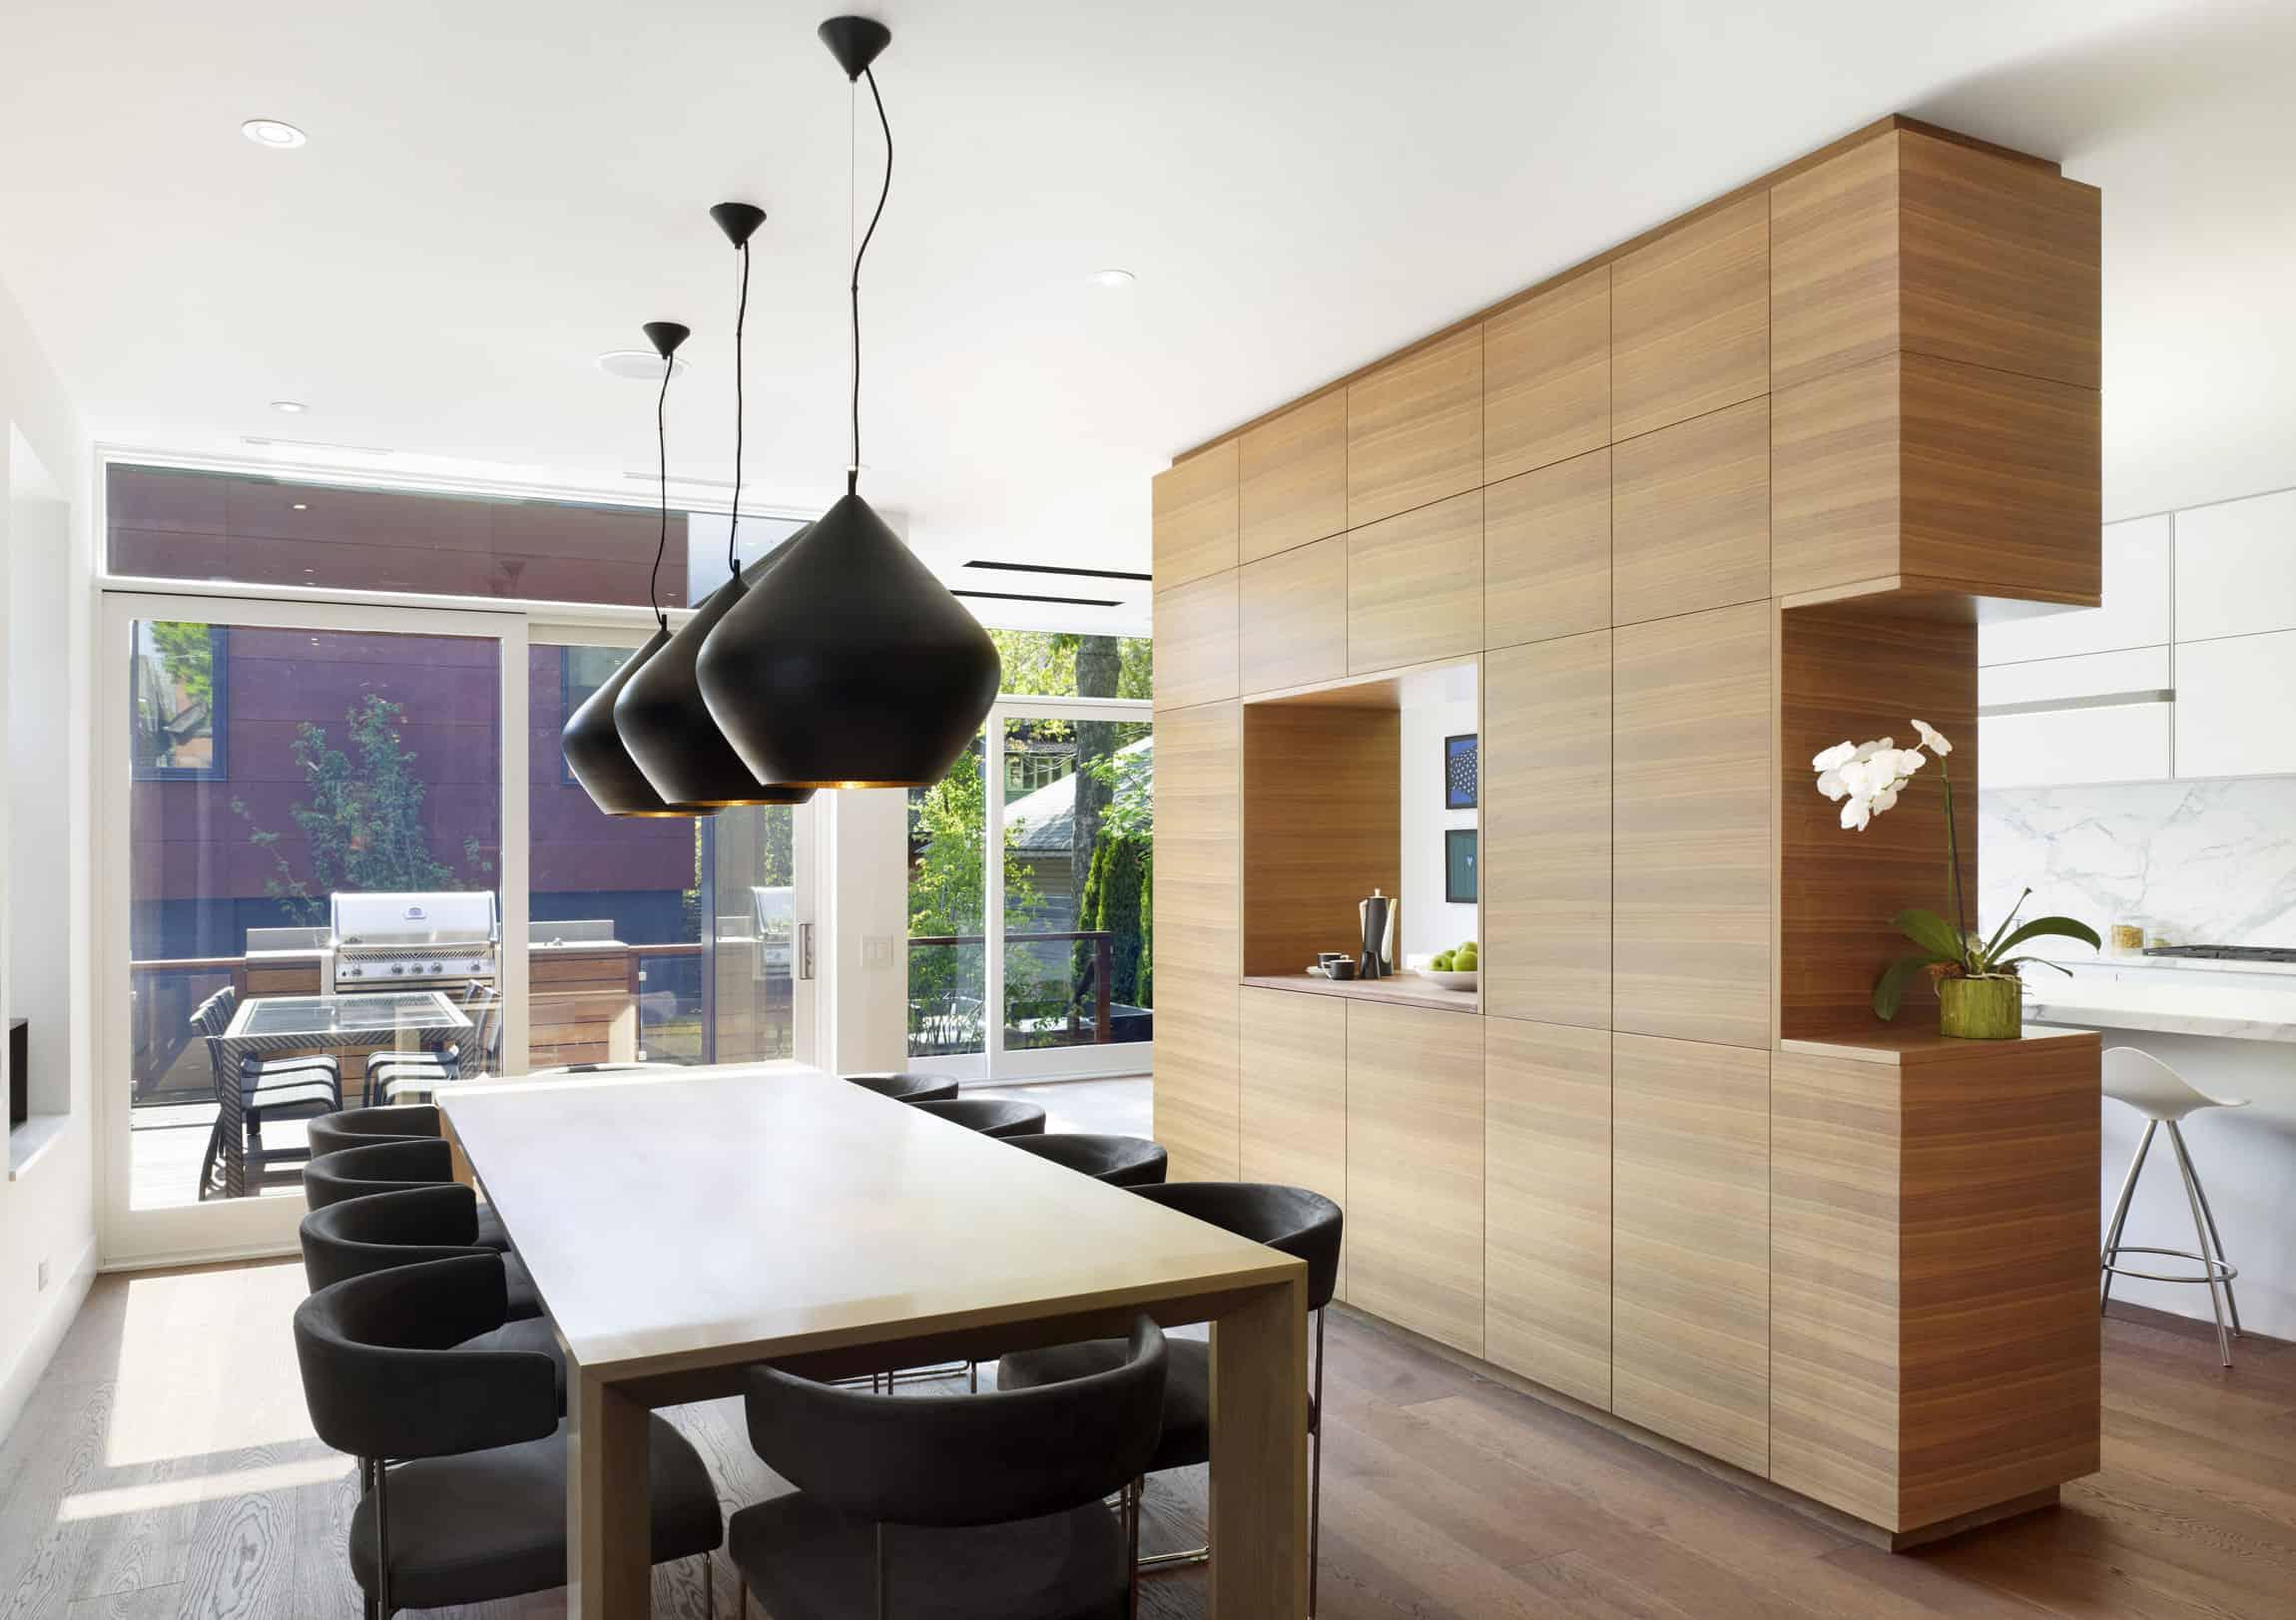 DUBBELDAM Architecture + Design Create an Elegant Contemporary Home in Toronto